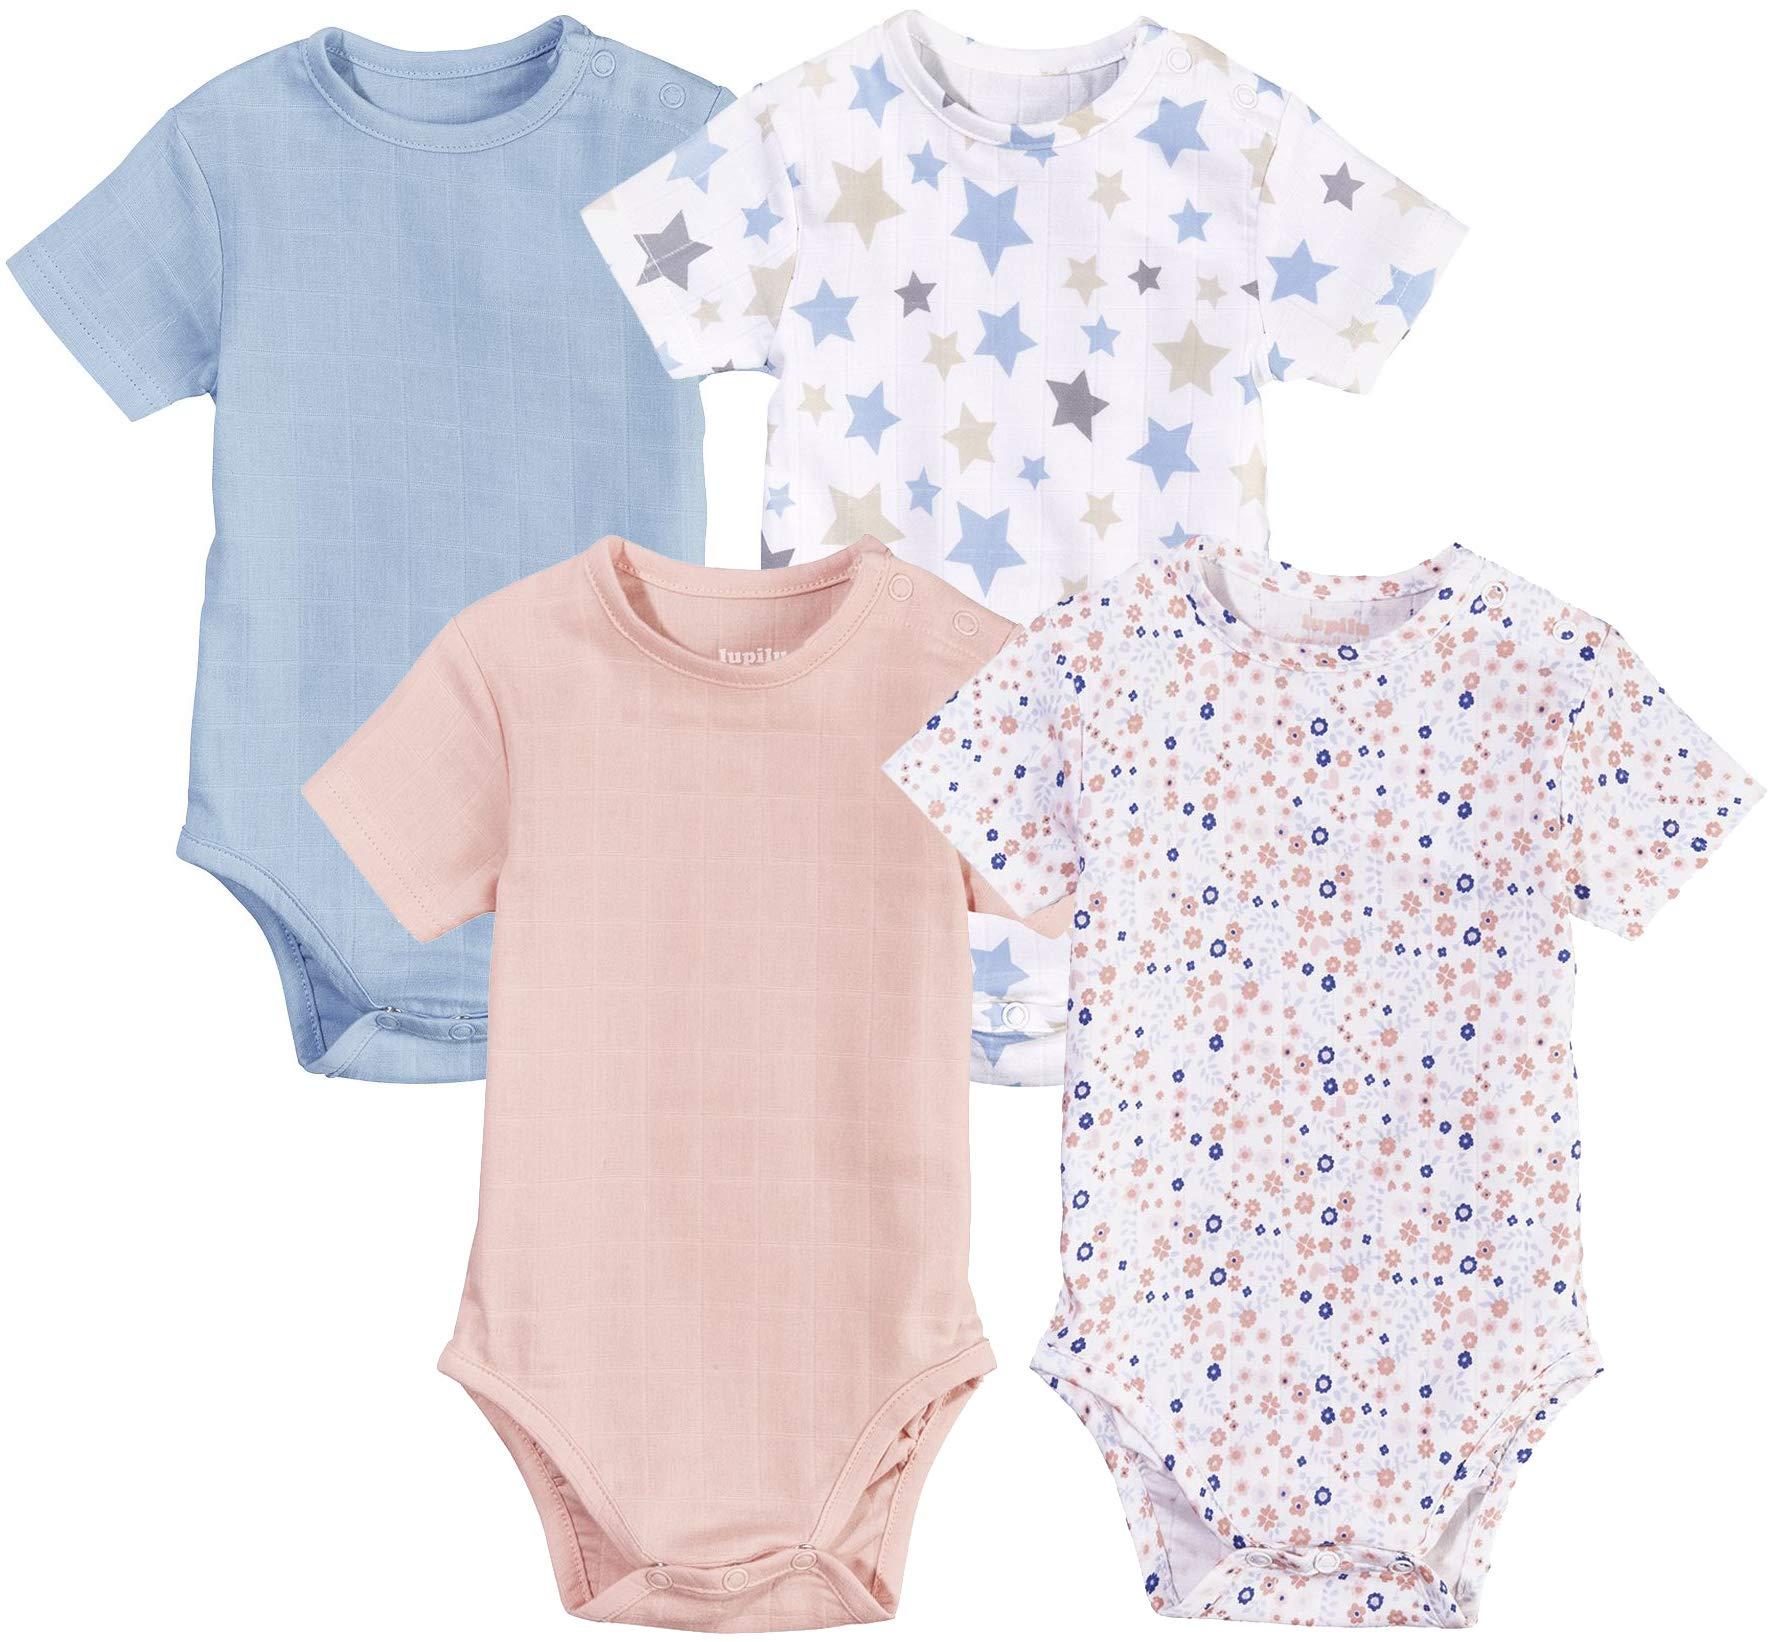 LUPILU PURE COLLECTION Baby Body, Kurzarm, Sommerbody Kurzarmbody aus Bio-Baumwolle